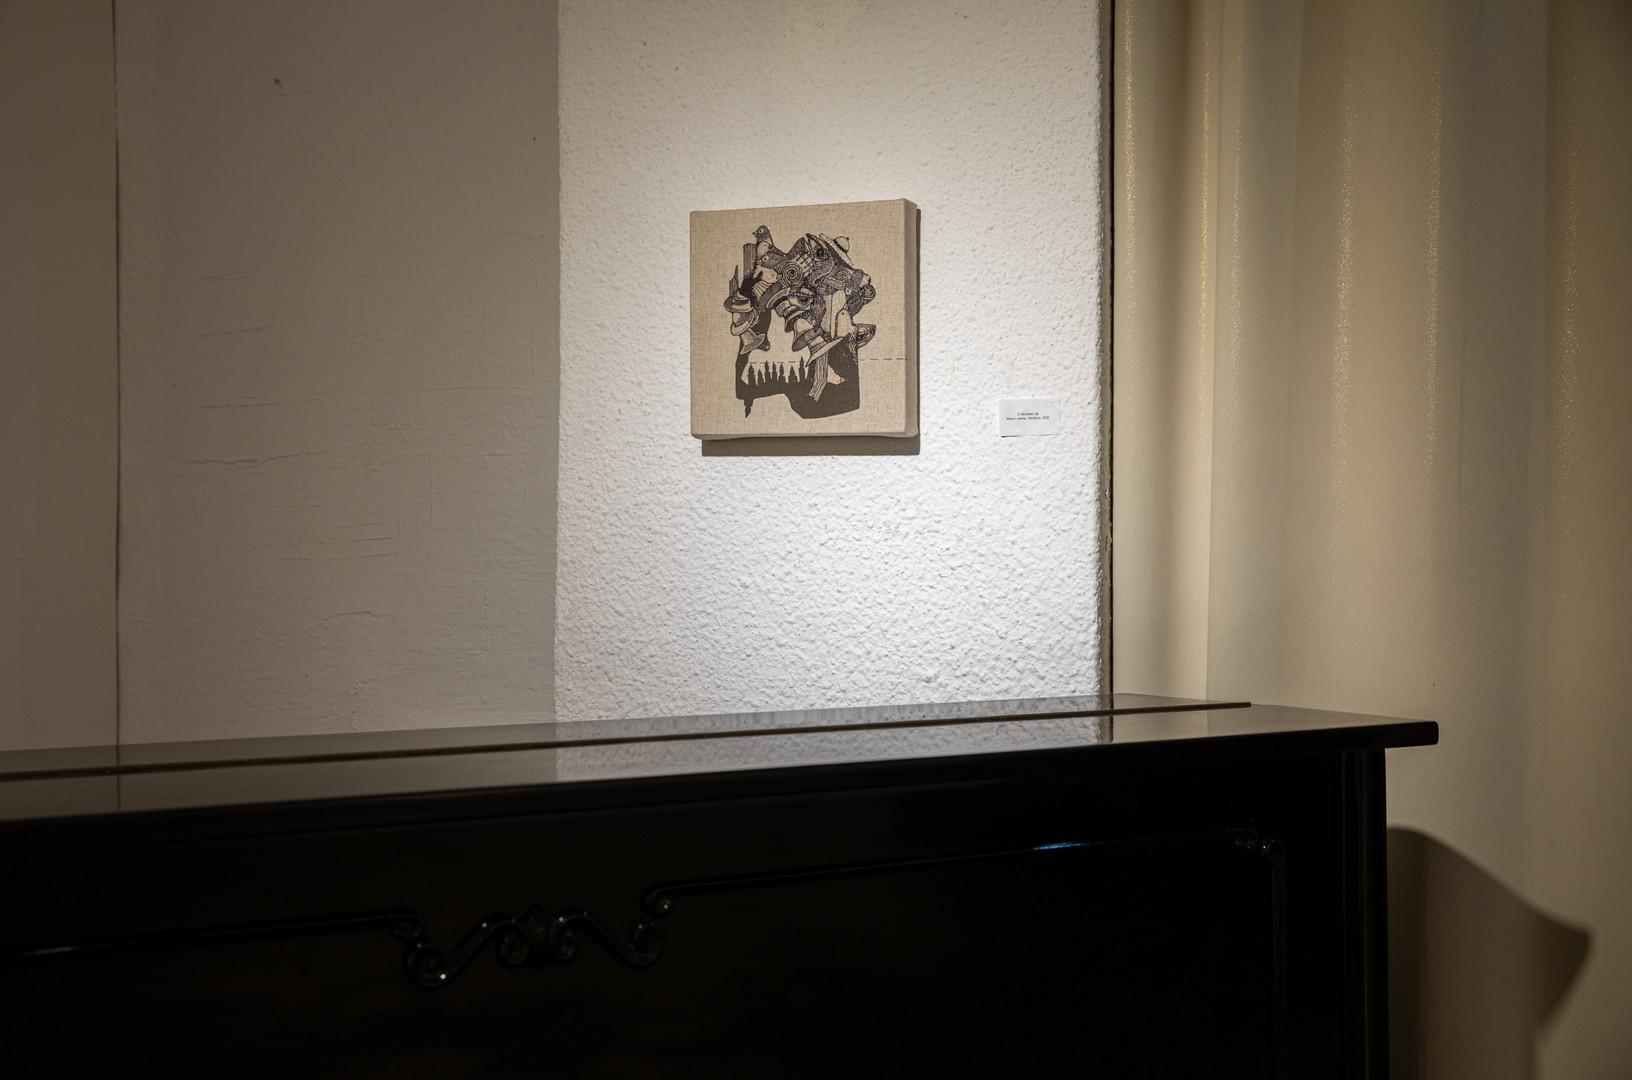 Exhibition View 7